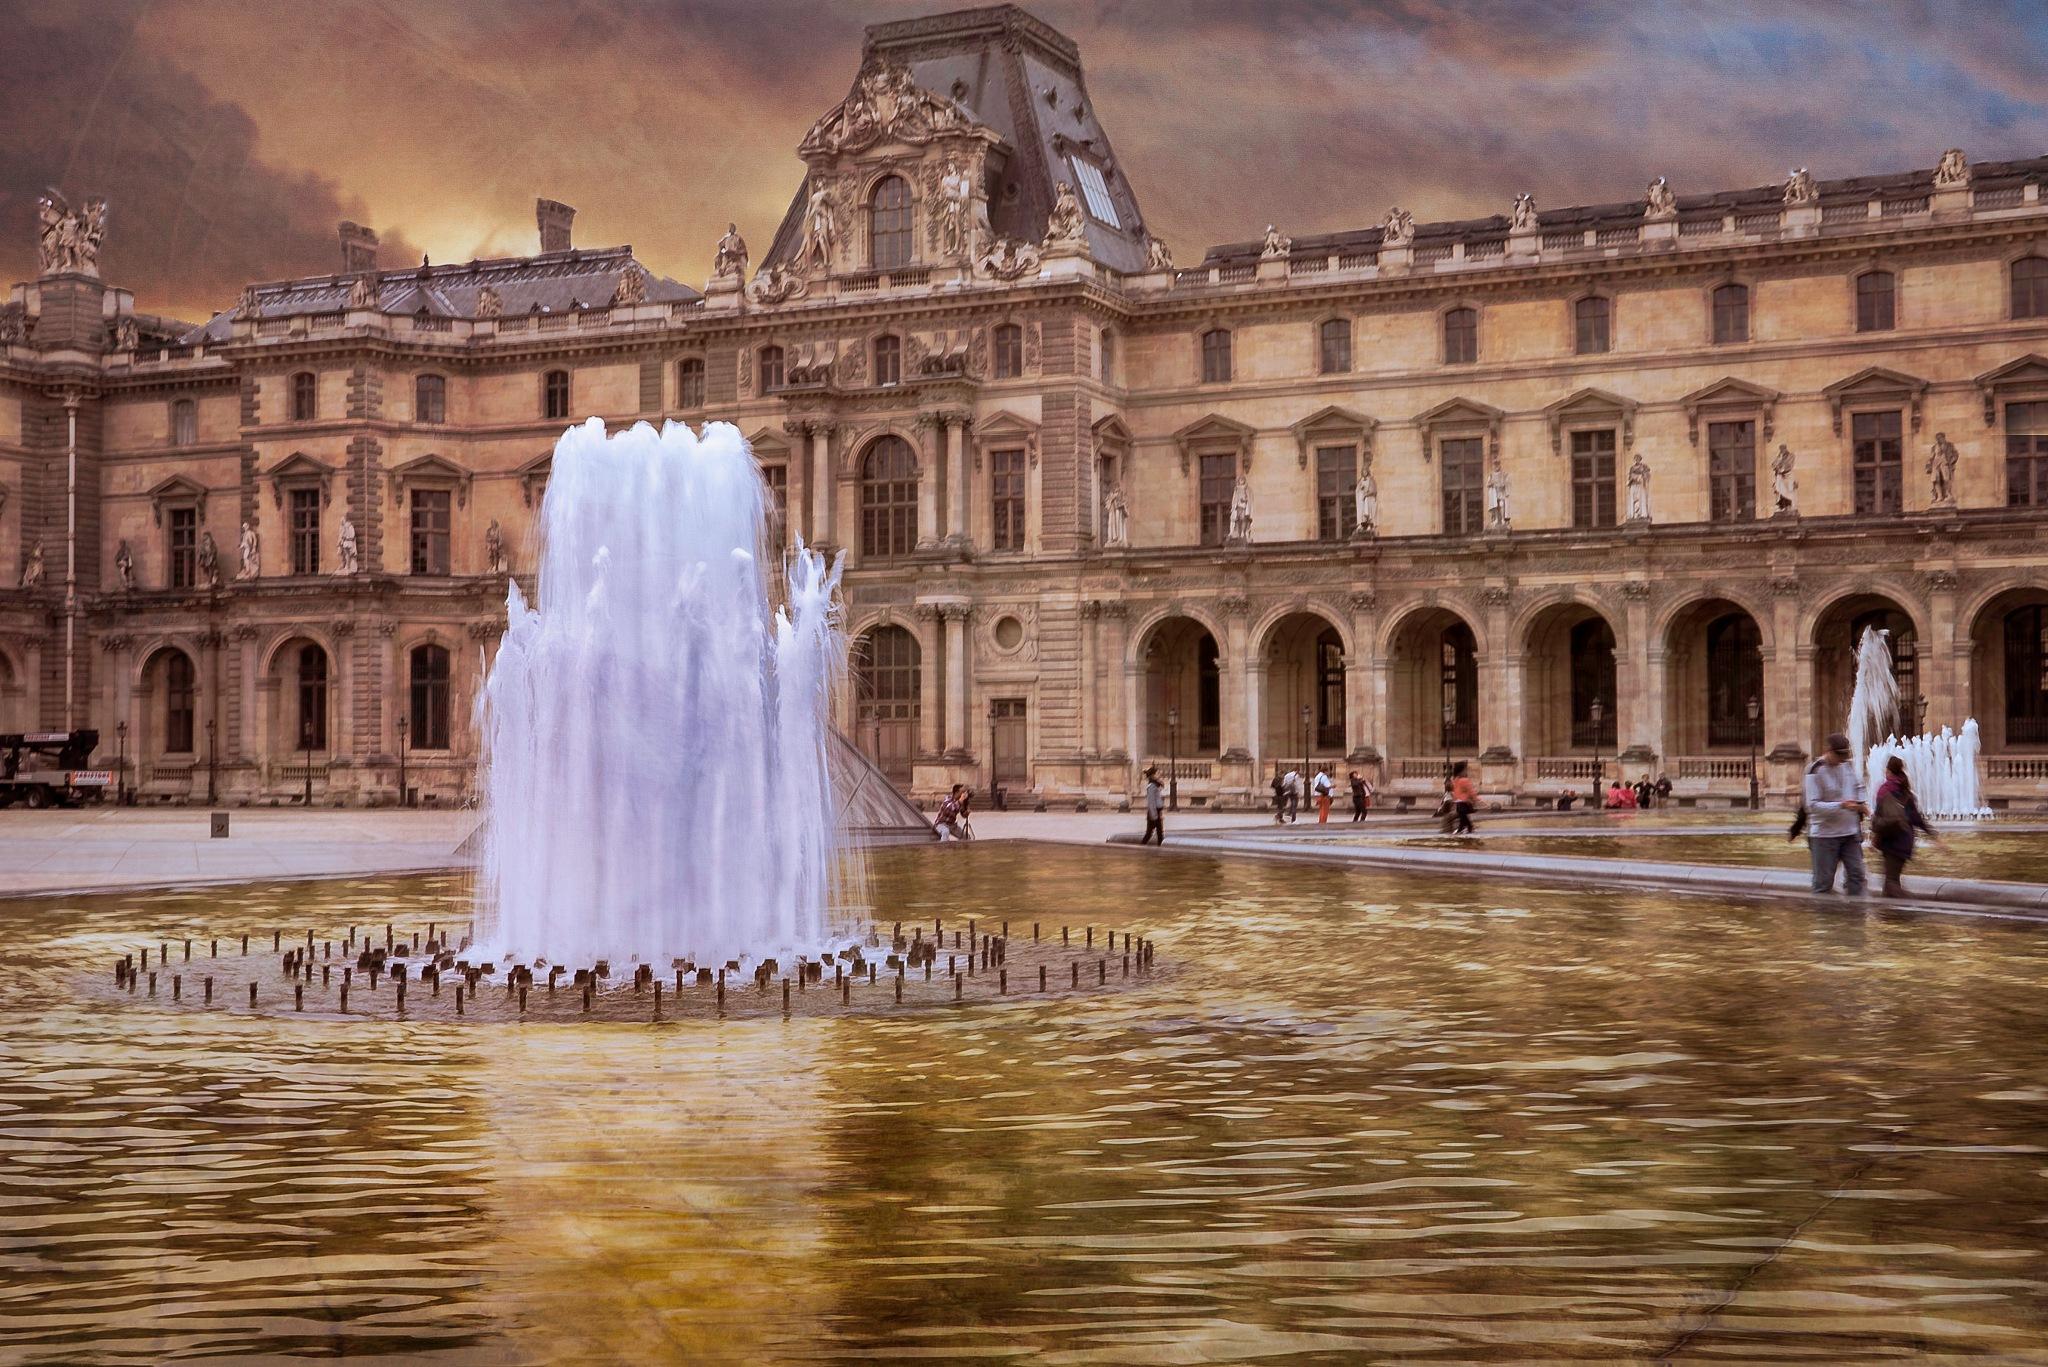 Louvre, Paris by Maureen Robinson